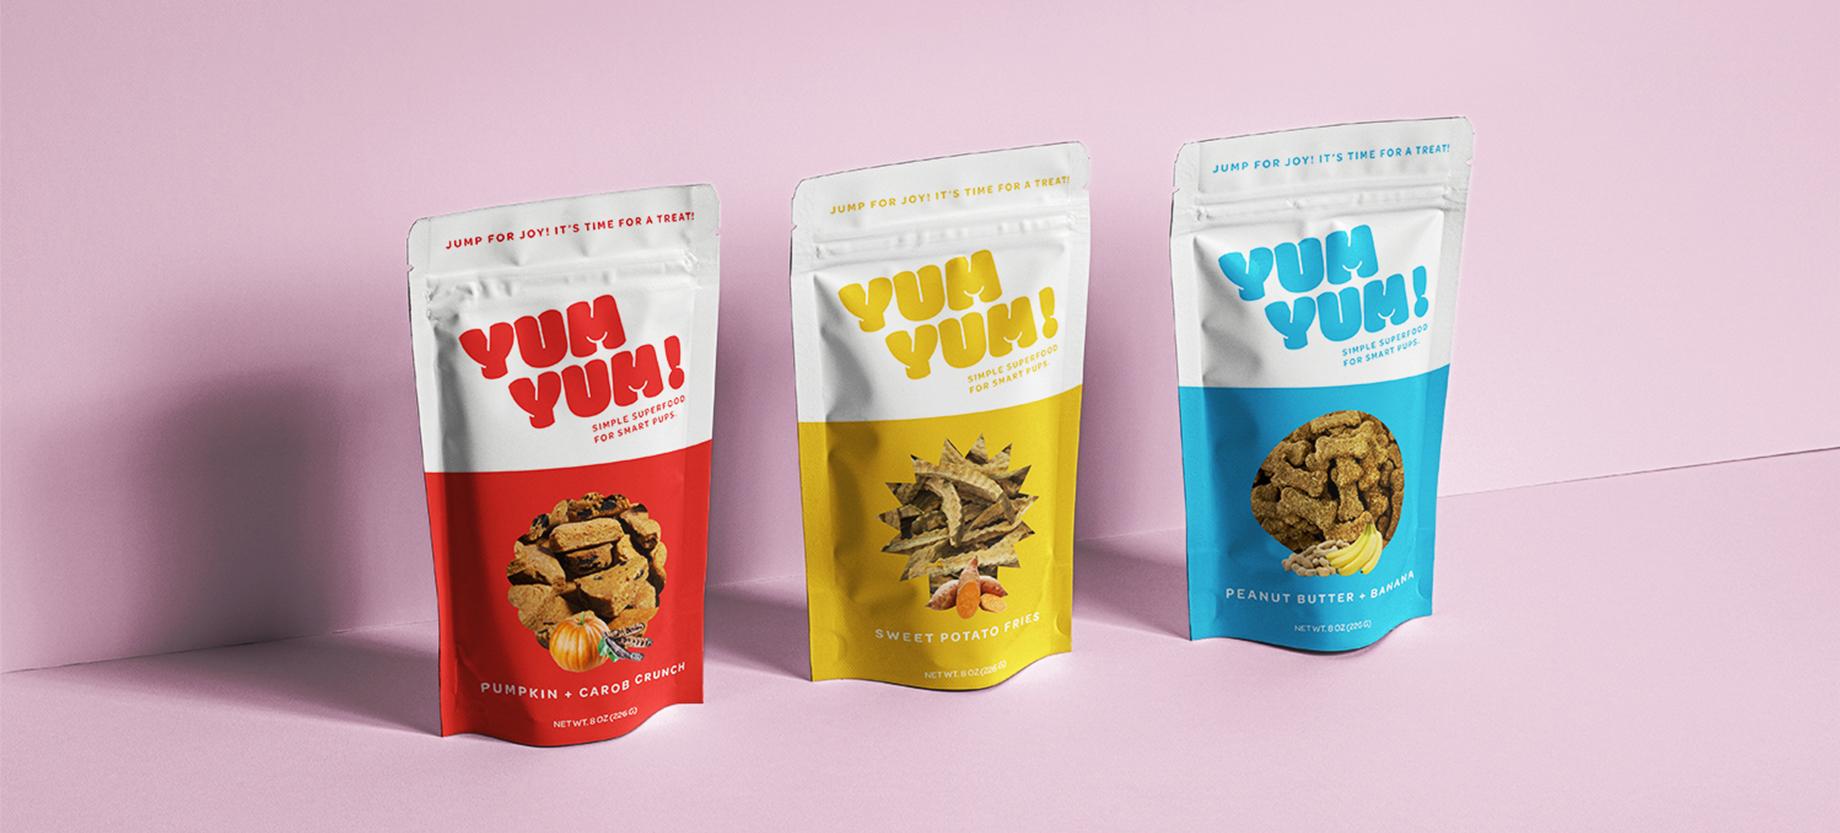 A row of Yum Yum! Dog treats packaging